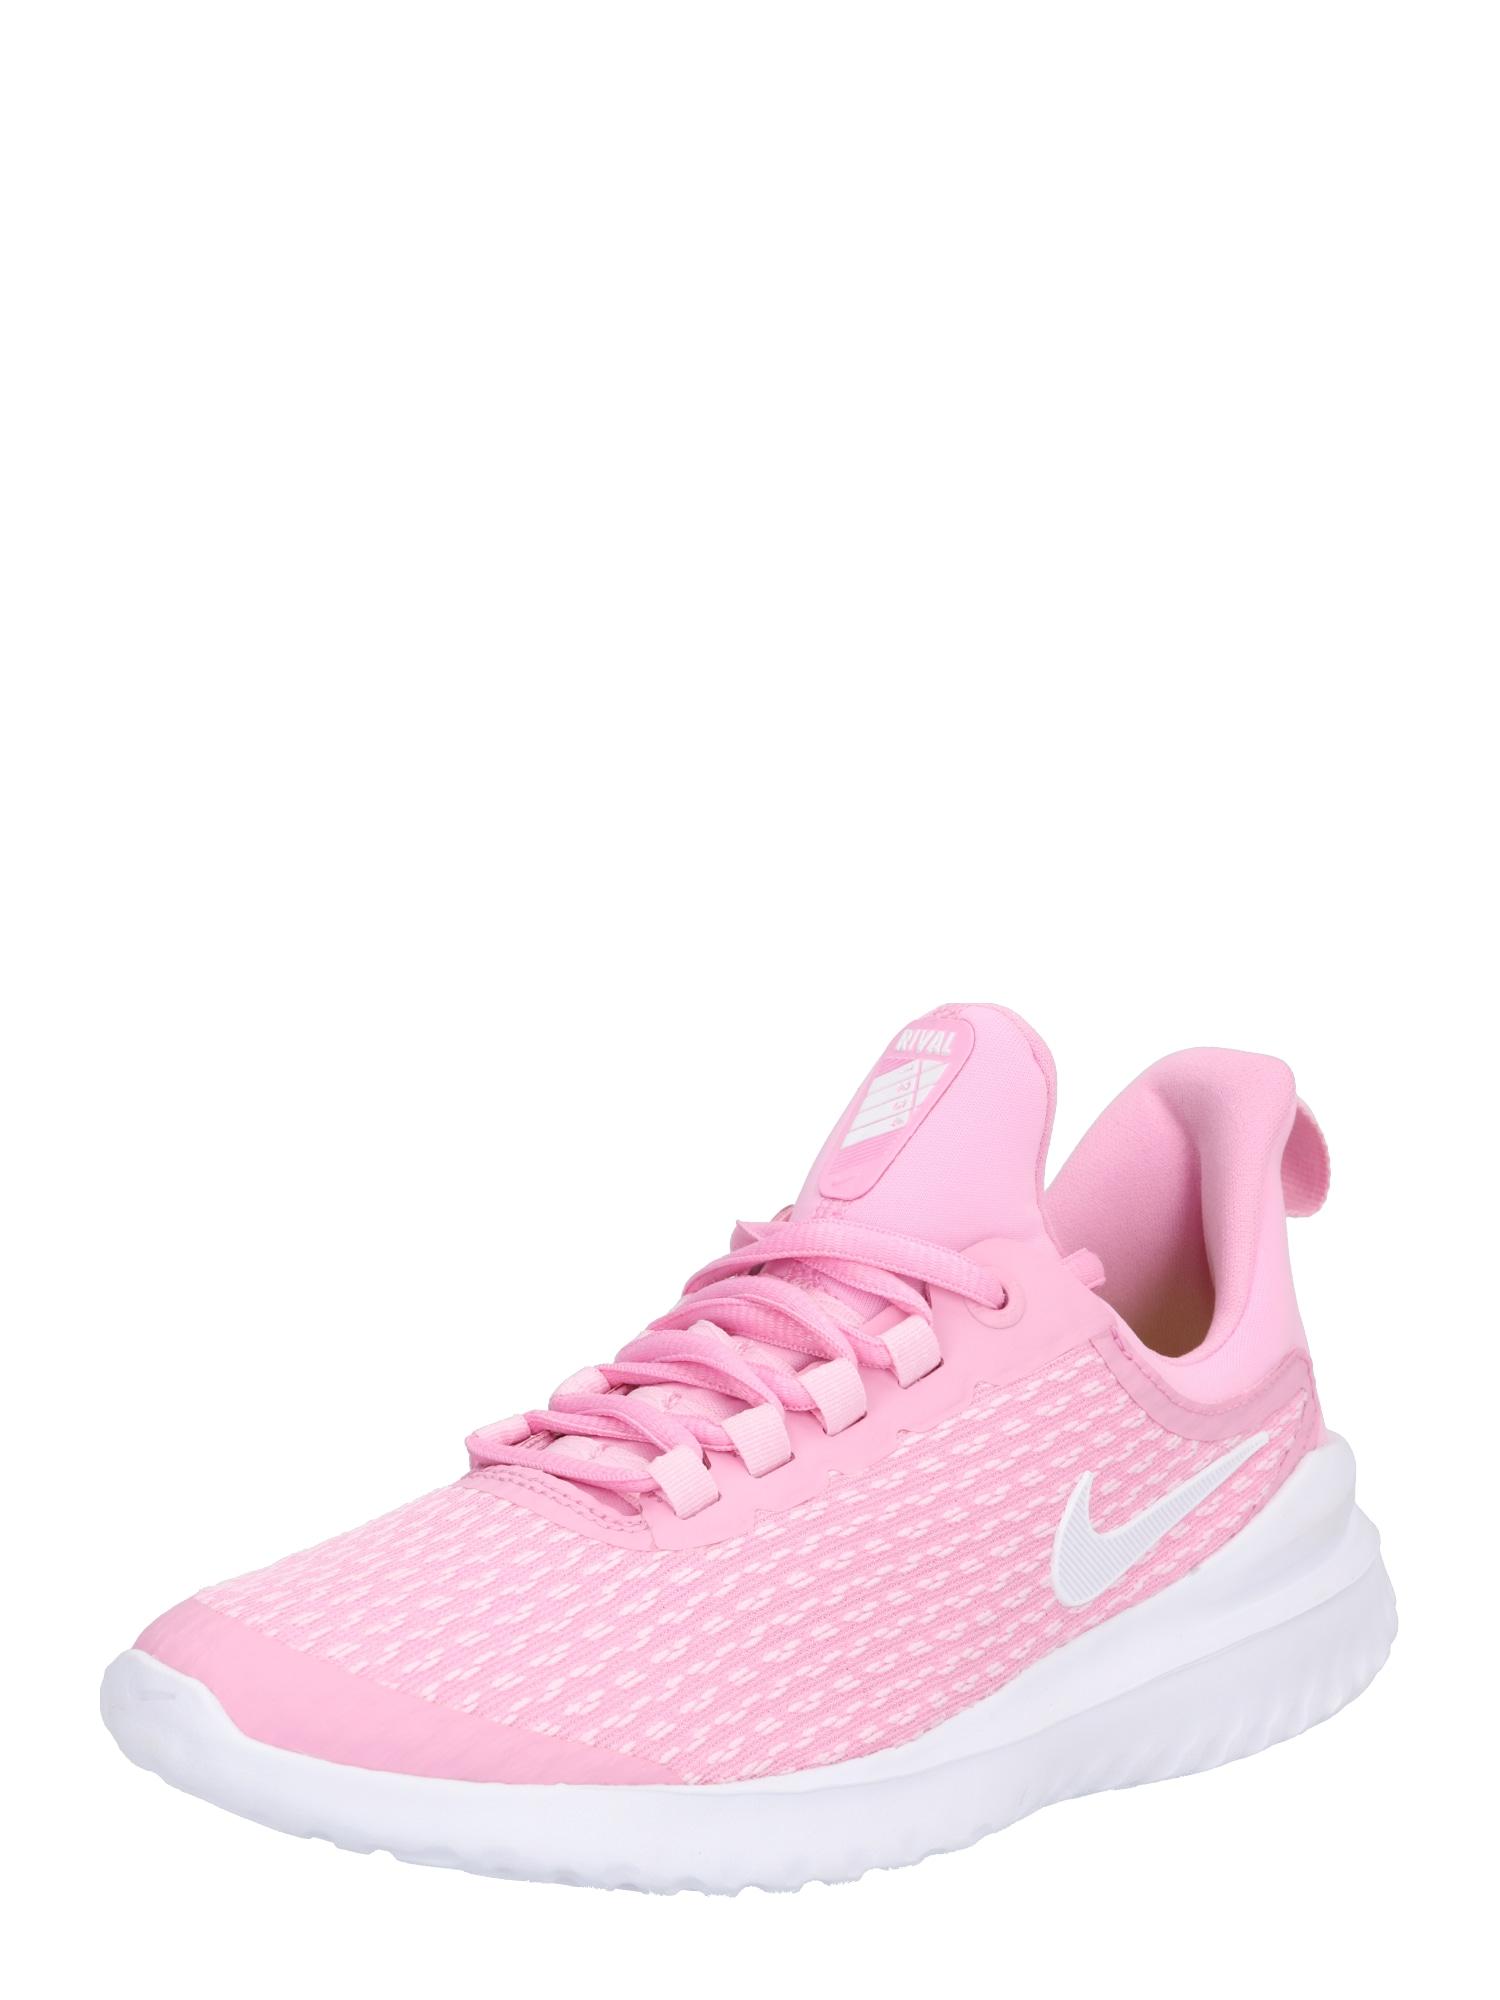 Sportovní boty Lunar Hayward růžová bílá NIKE